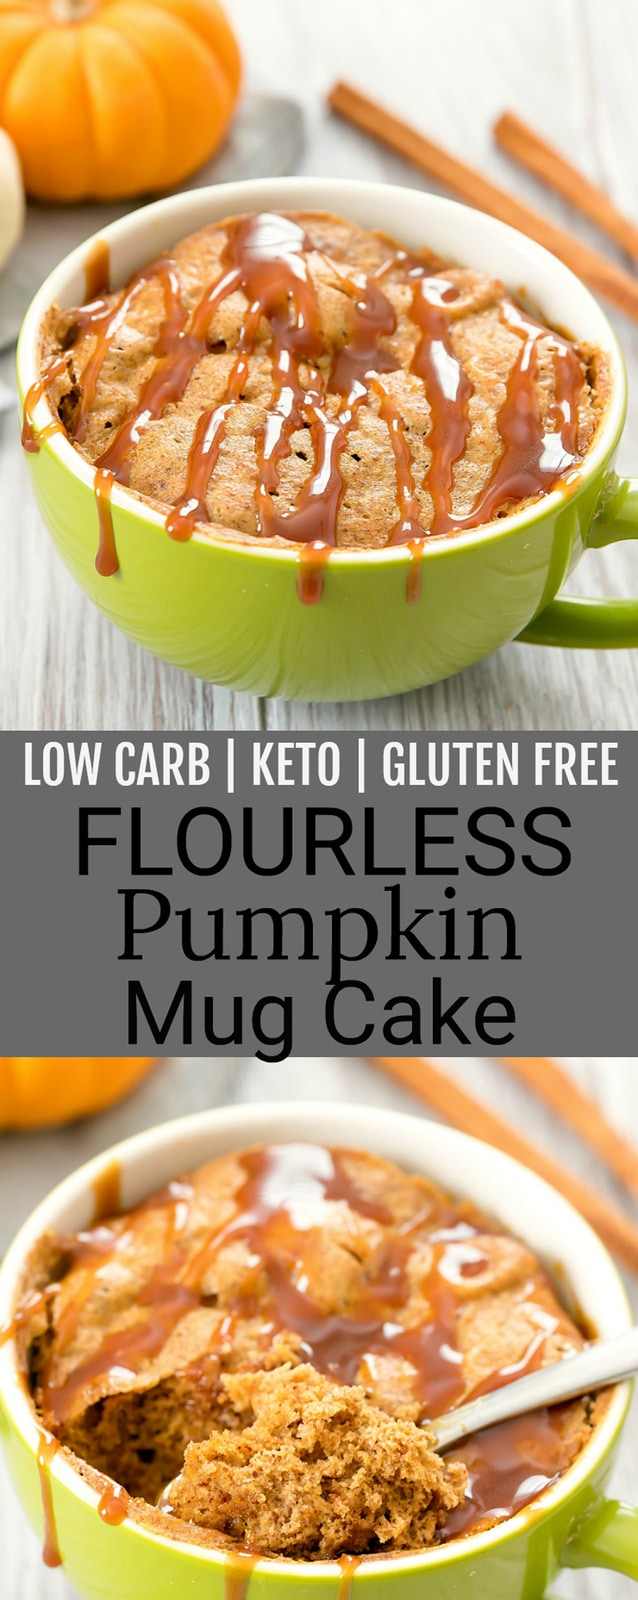 Flourless Pumpkin Mug Cake. This easy microwave mug cake is low carb, keto and gluten free!